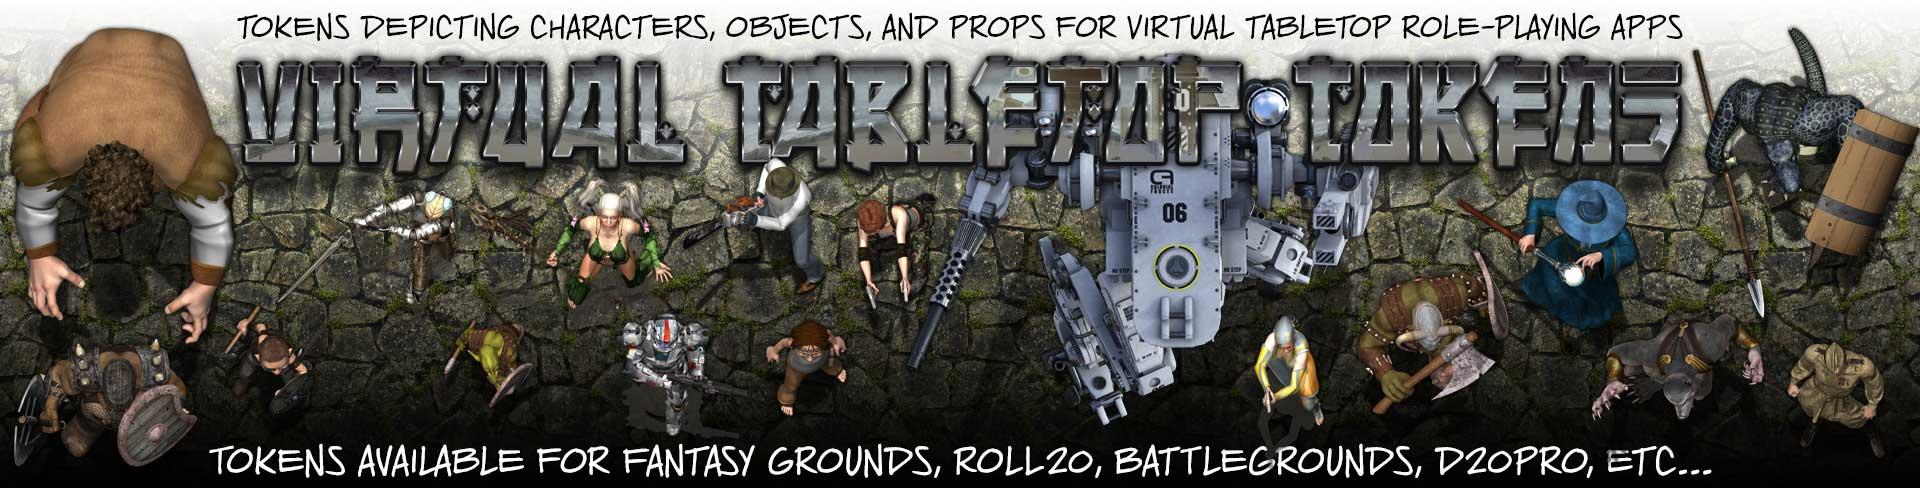 Virtual Tabletop Tokens